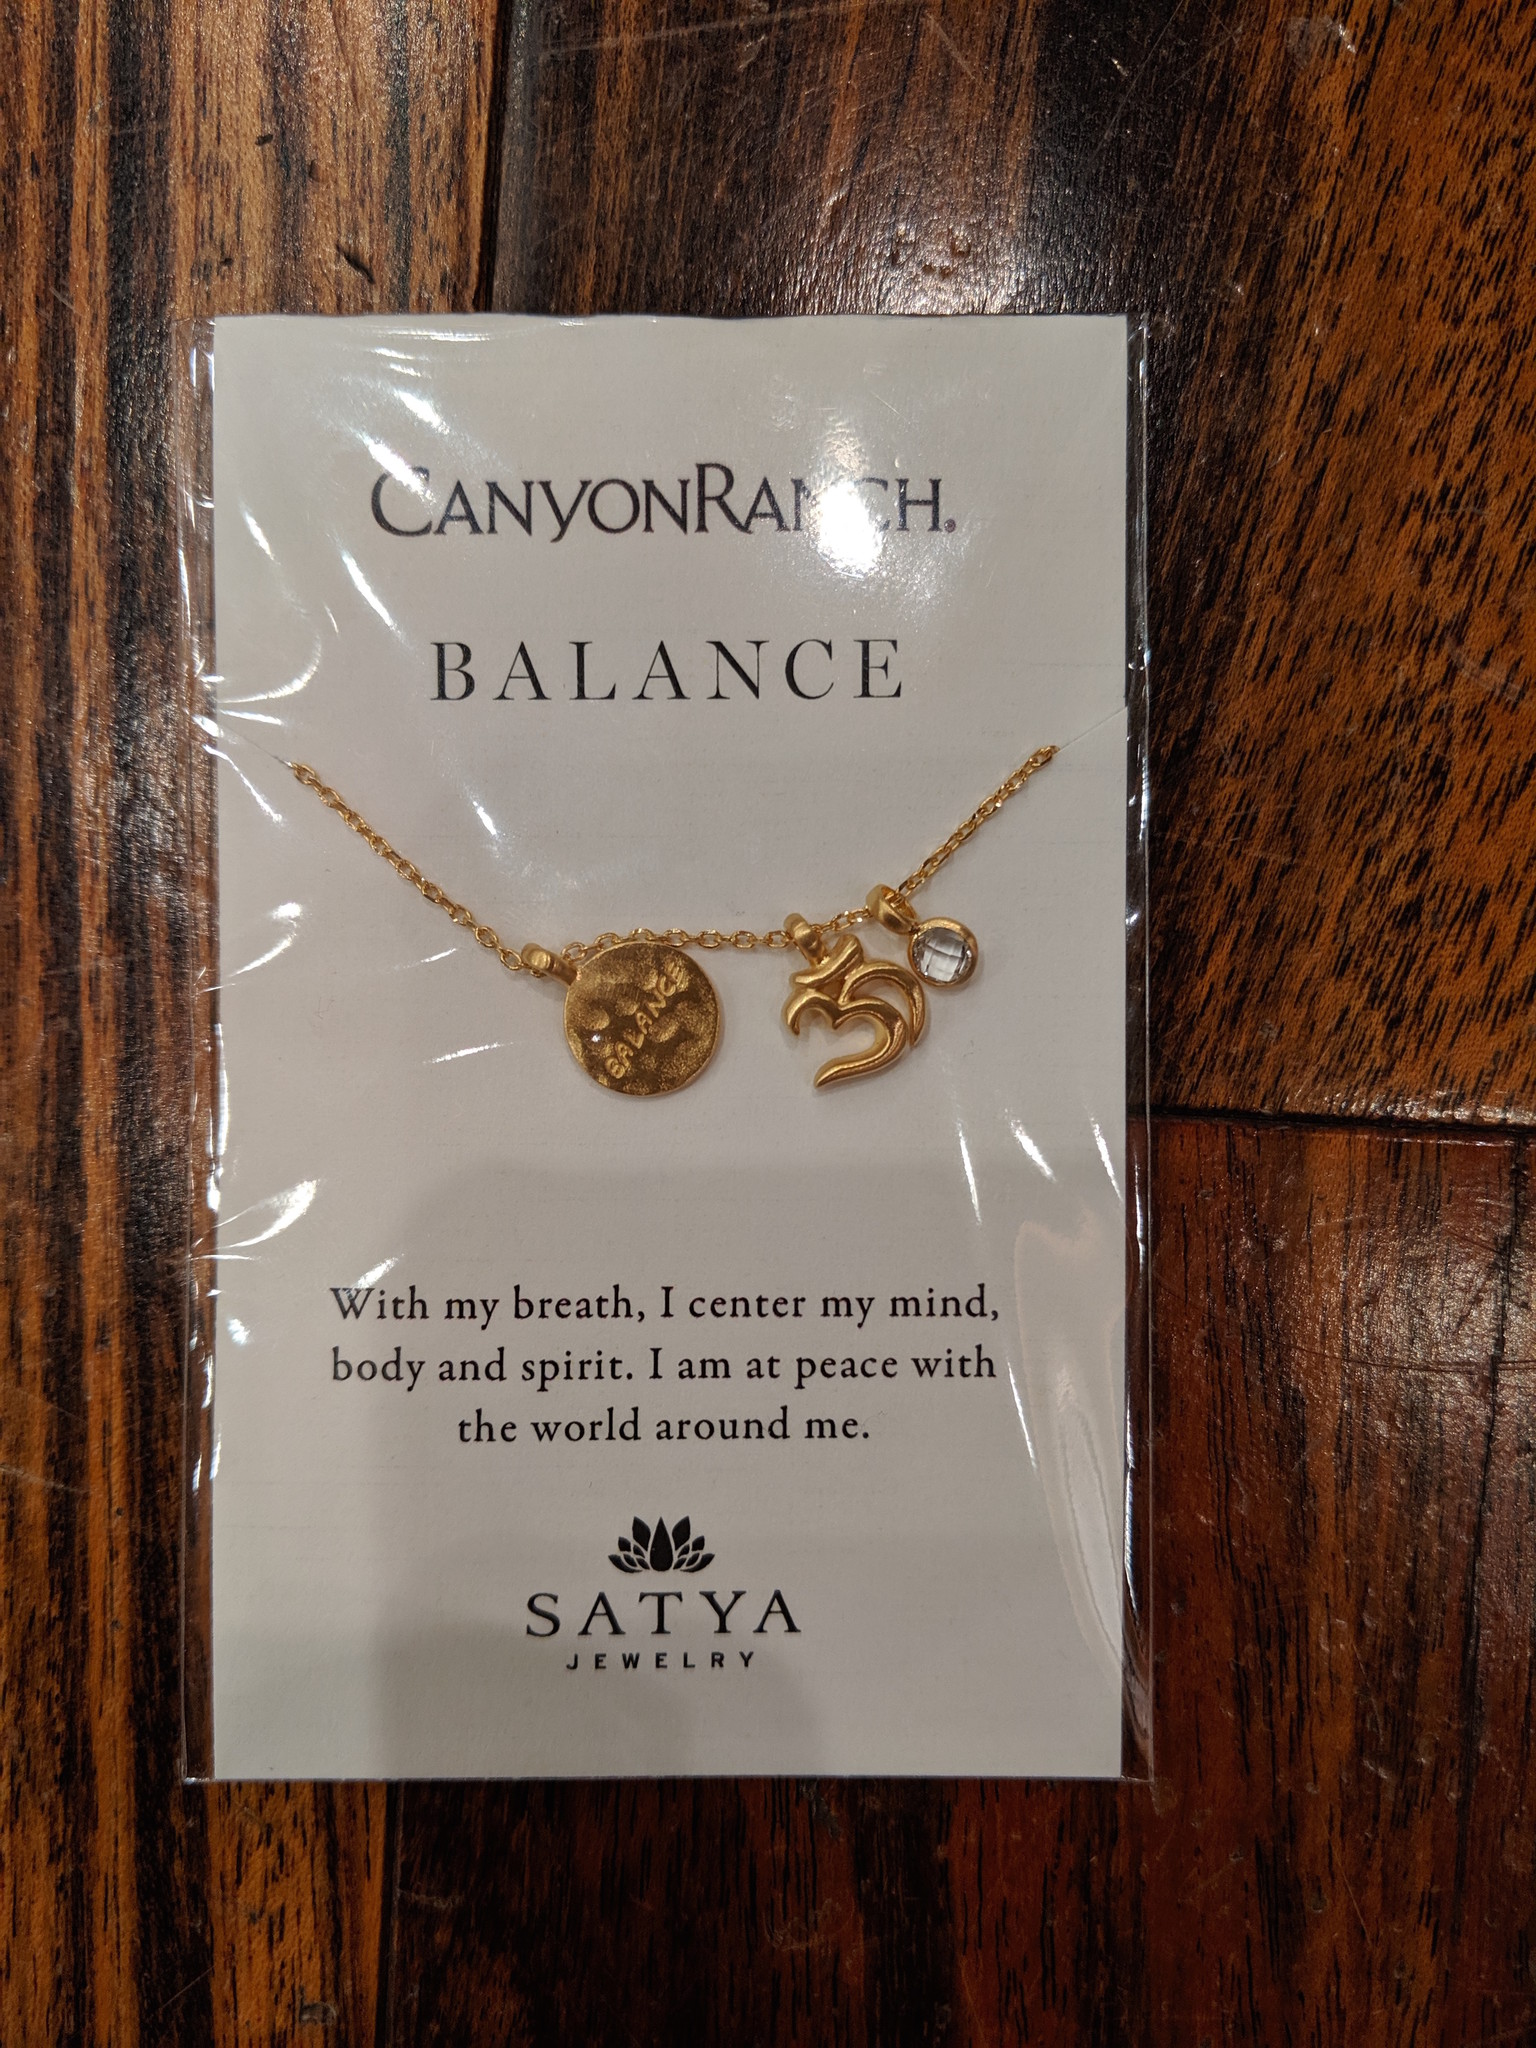 Satya Canyon Ranch Balance White Topaz Necklace